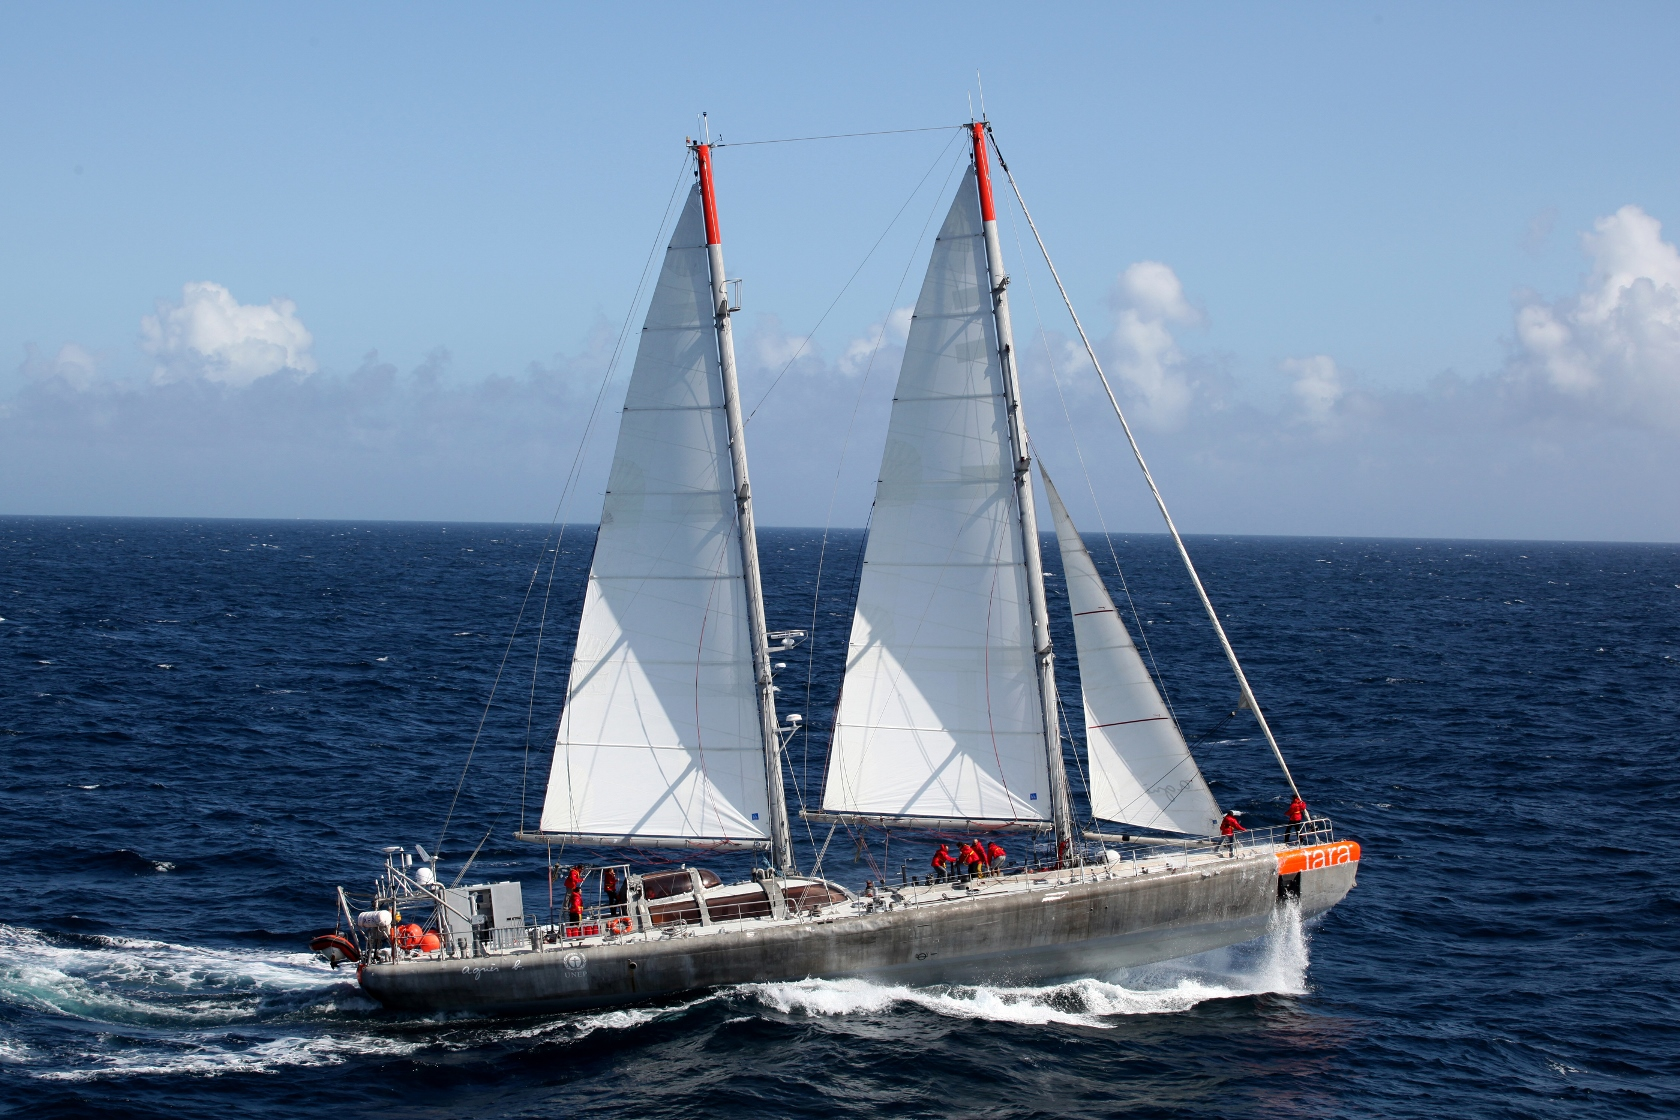 36M Yacht 'Tara' Hauls Out at Oceania Marine Shipyards - Teaser Image